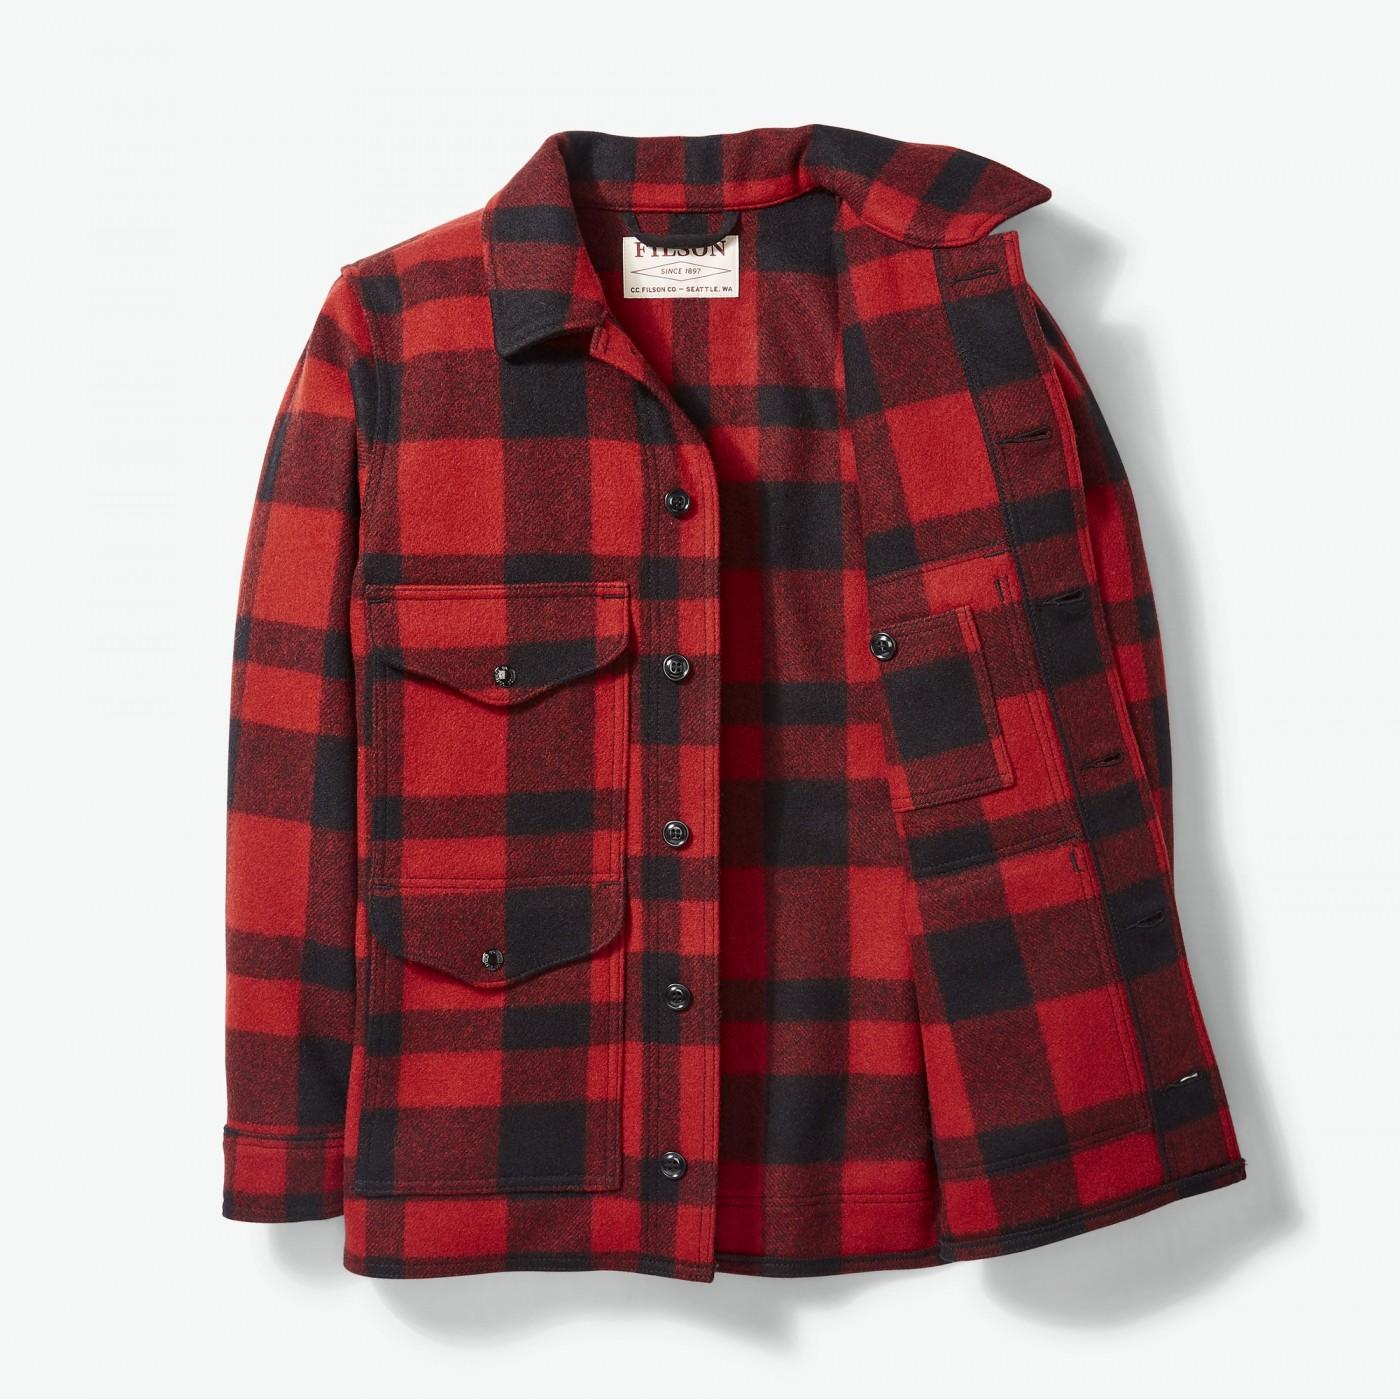 Tee shirt Barbour Steve McQueen Desert Tee Chilli red